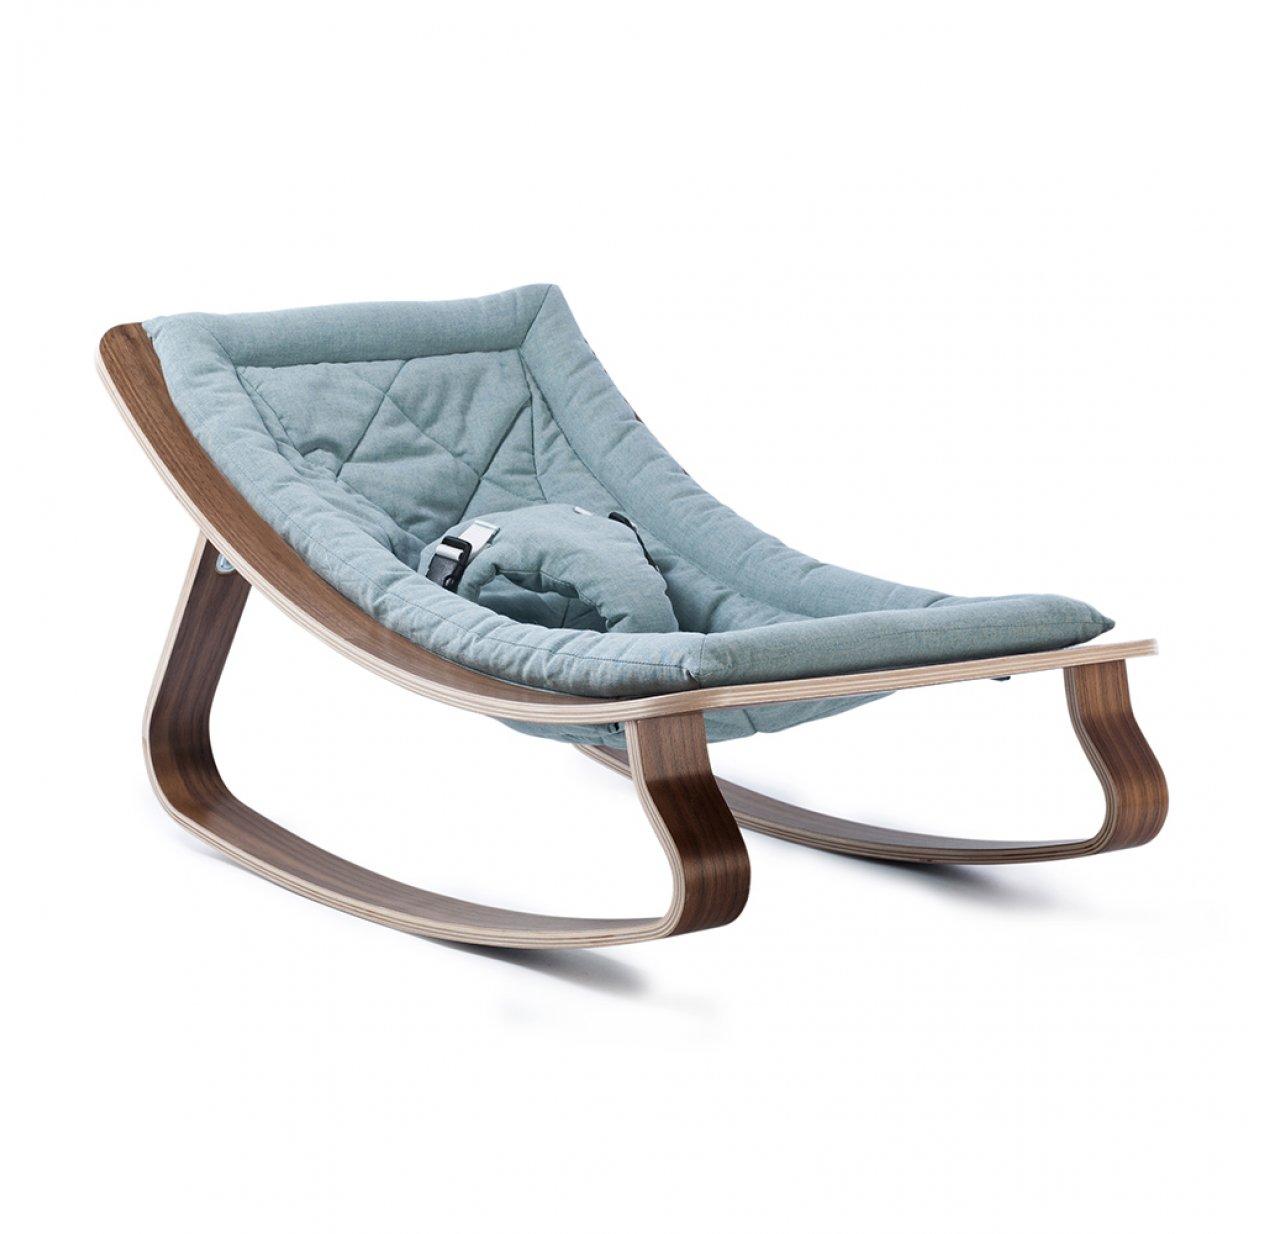 transat b b levo noyer aruba blue bleu charlie crane. Black Bedroom Furniture Sets. Home Design Ideas